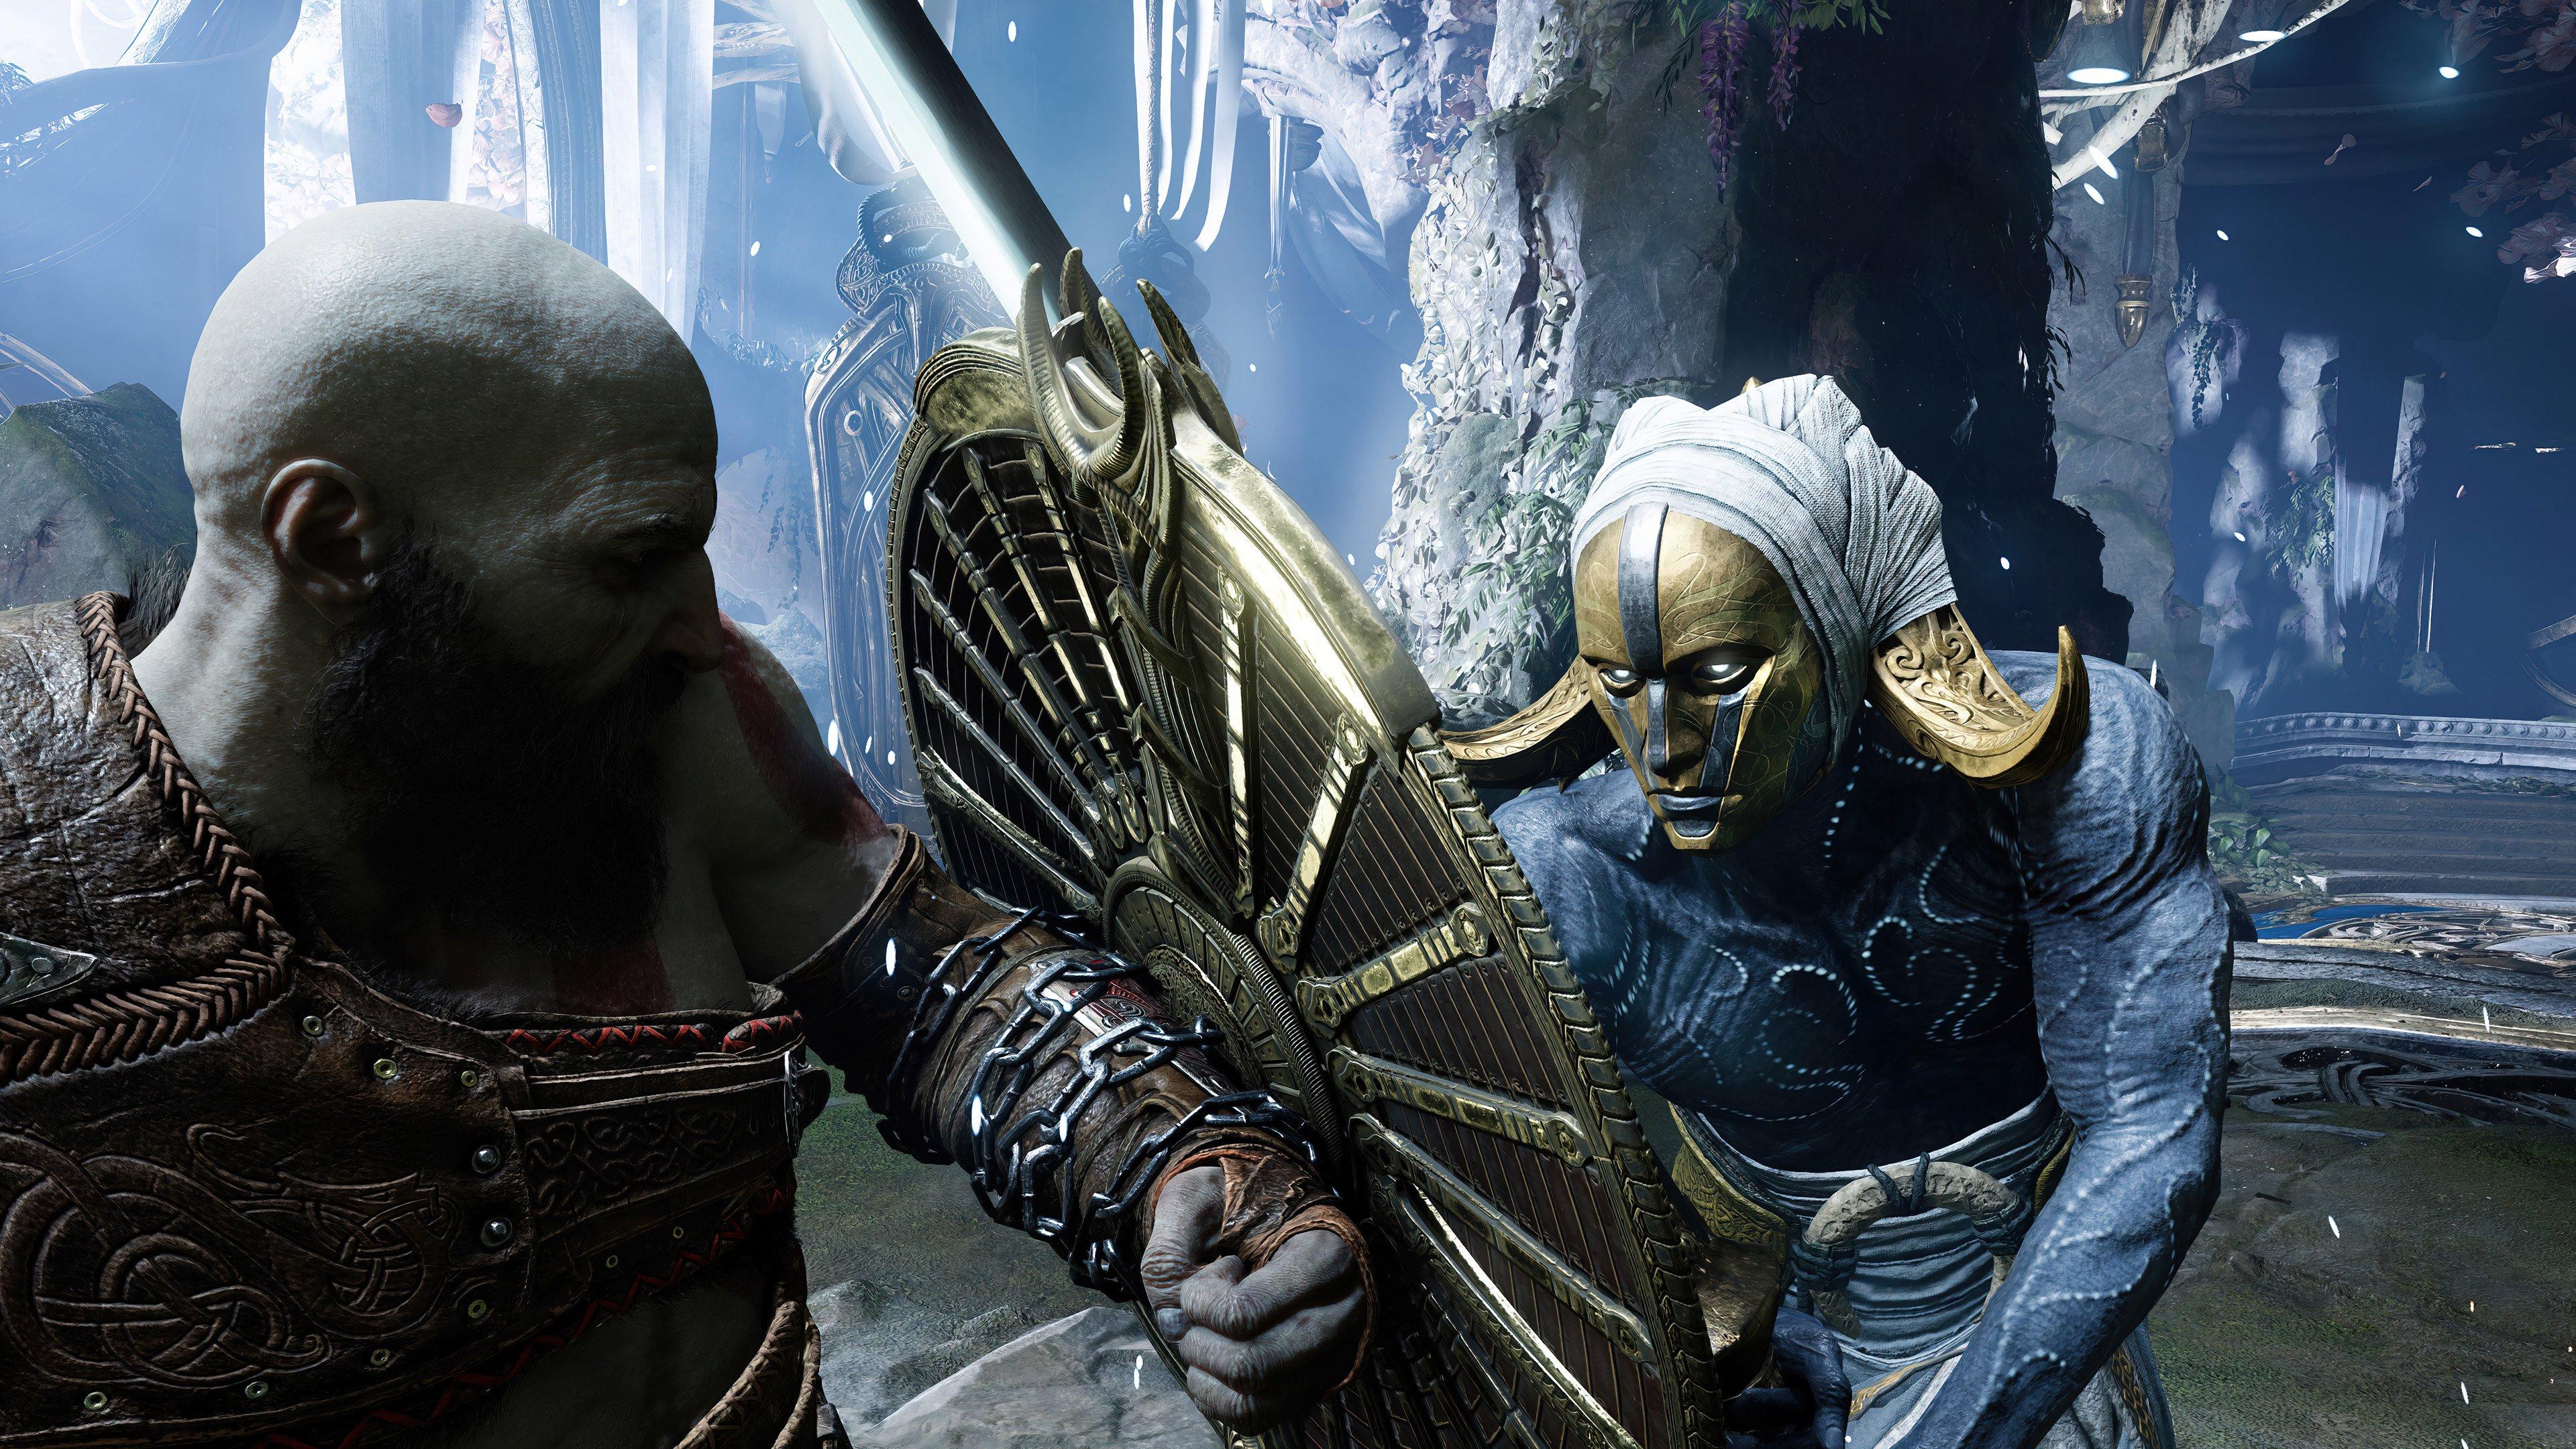 Fondos de pantalla Kratos y Ragnarok God of War